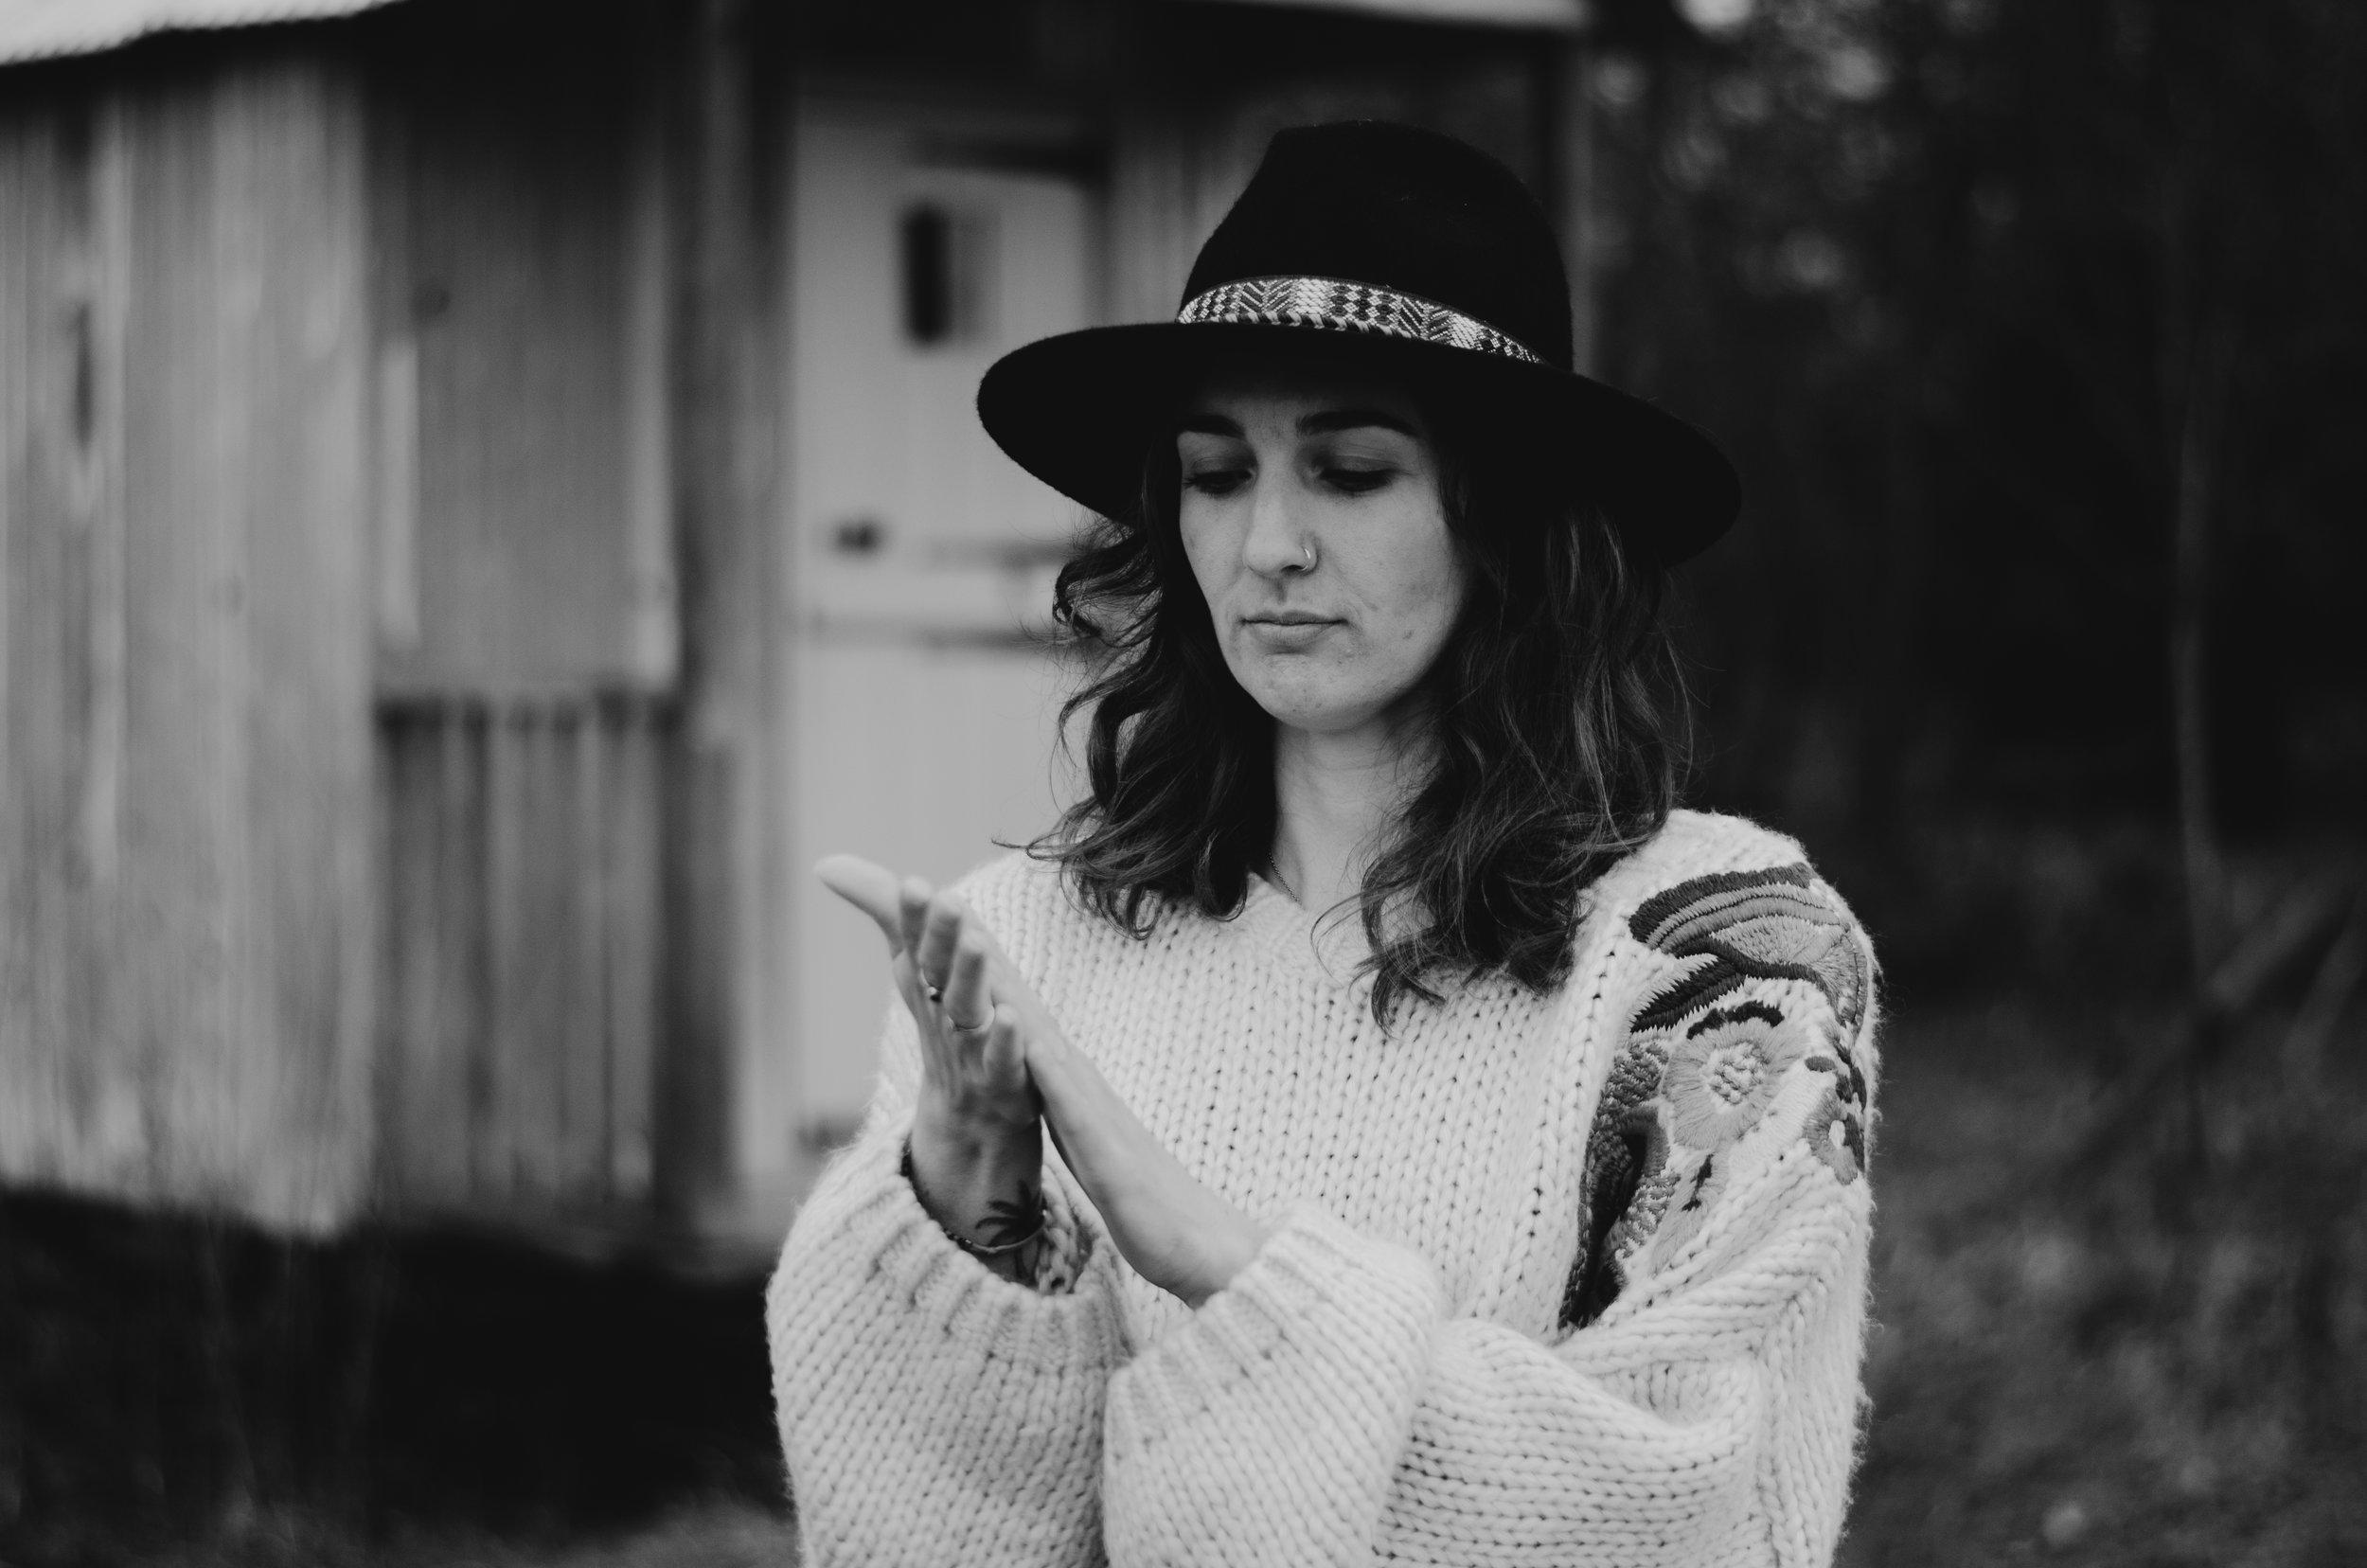 Chloe - Portraits - Aiste Saulyte Photography - 2018-01-05-82.jpg